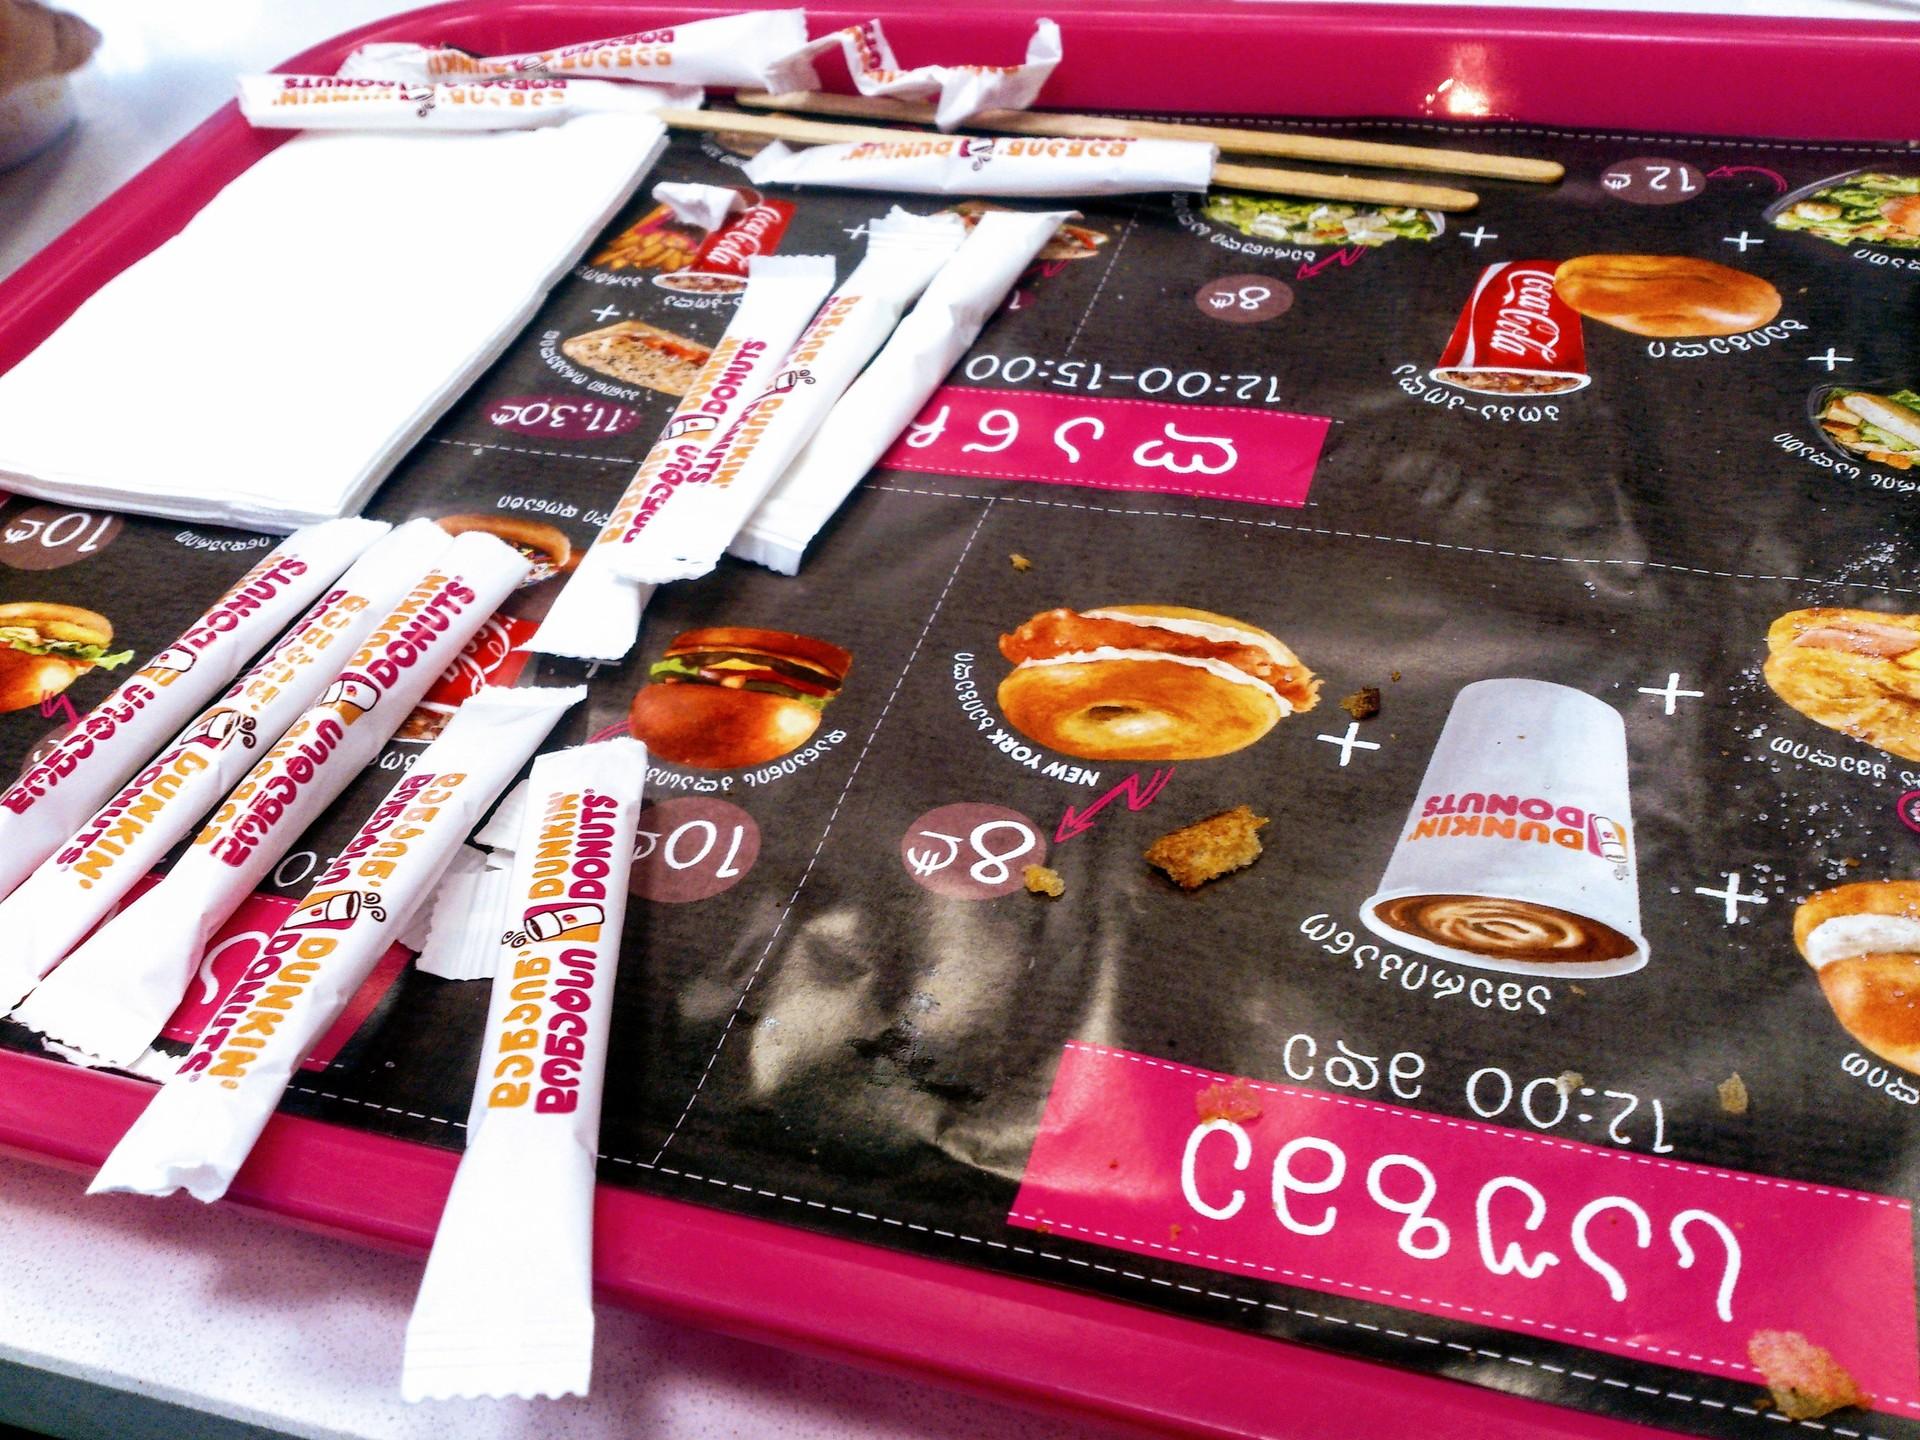 dunkin-donuts-menues-6c446681e5454adf7b4